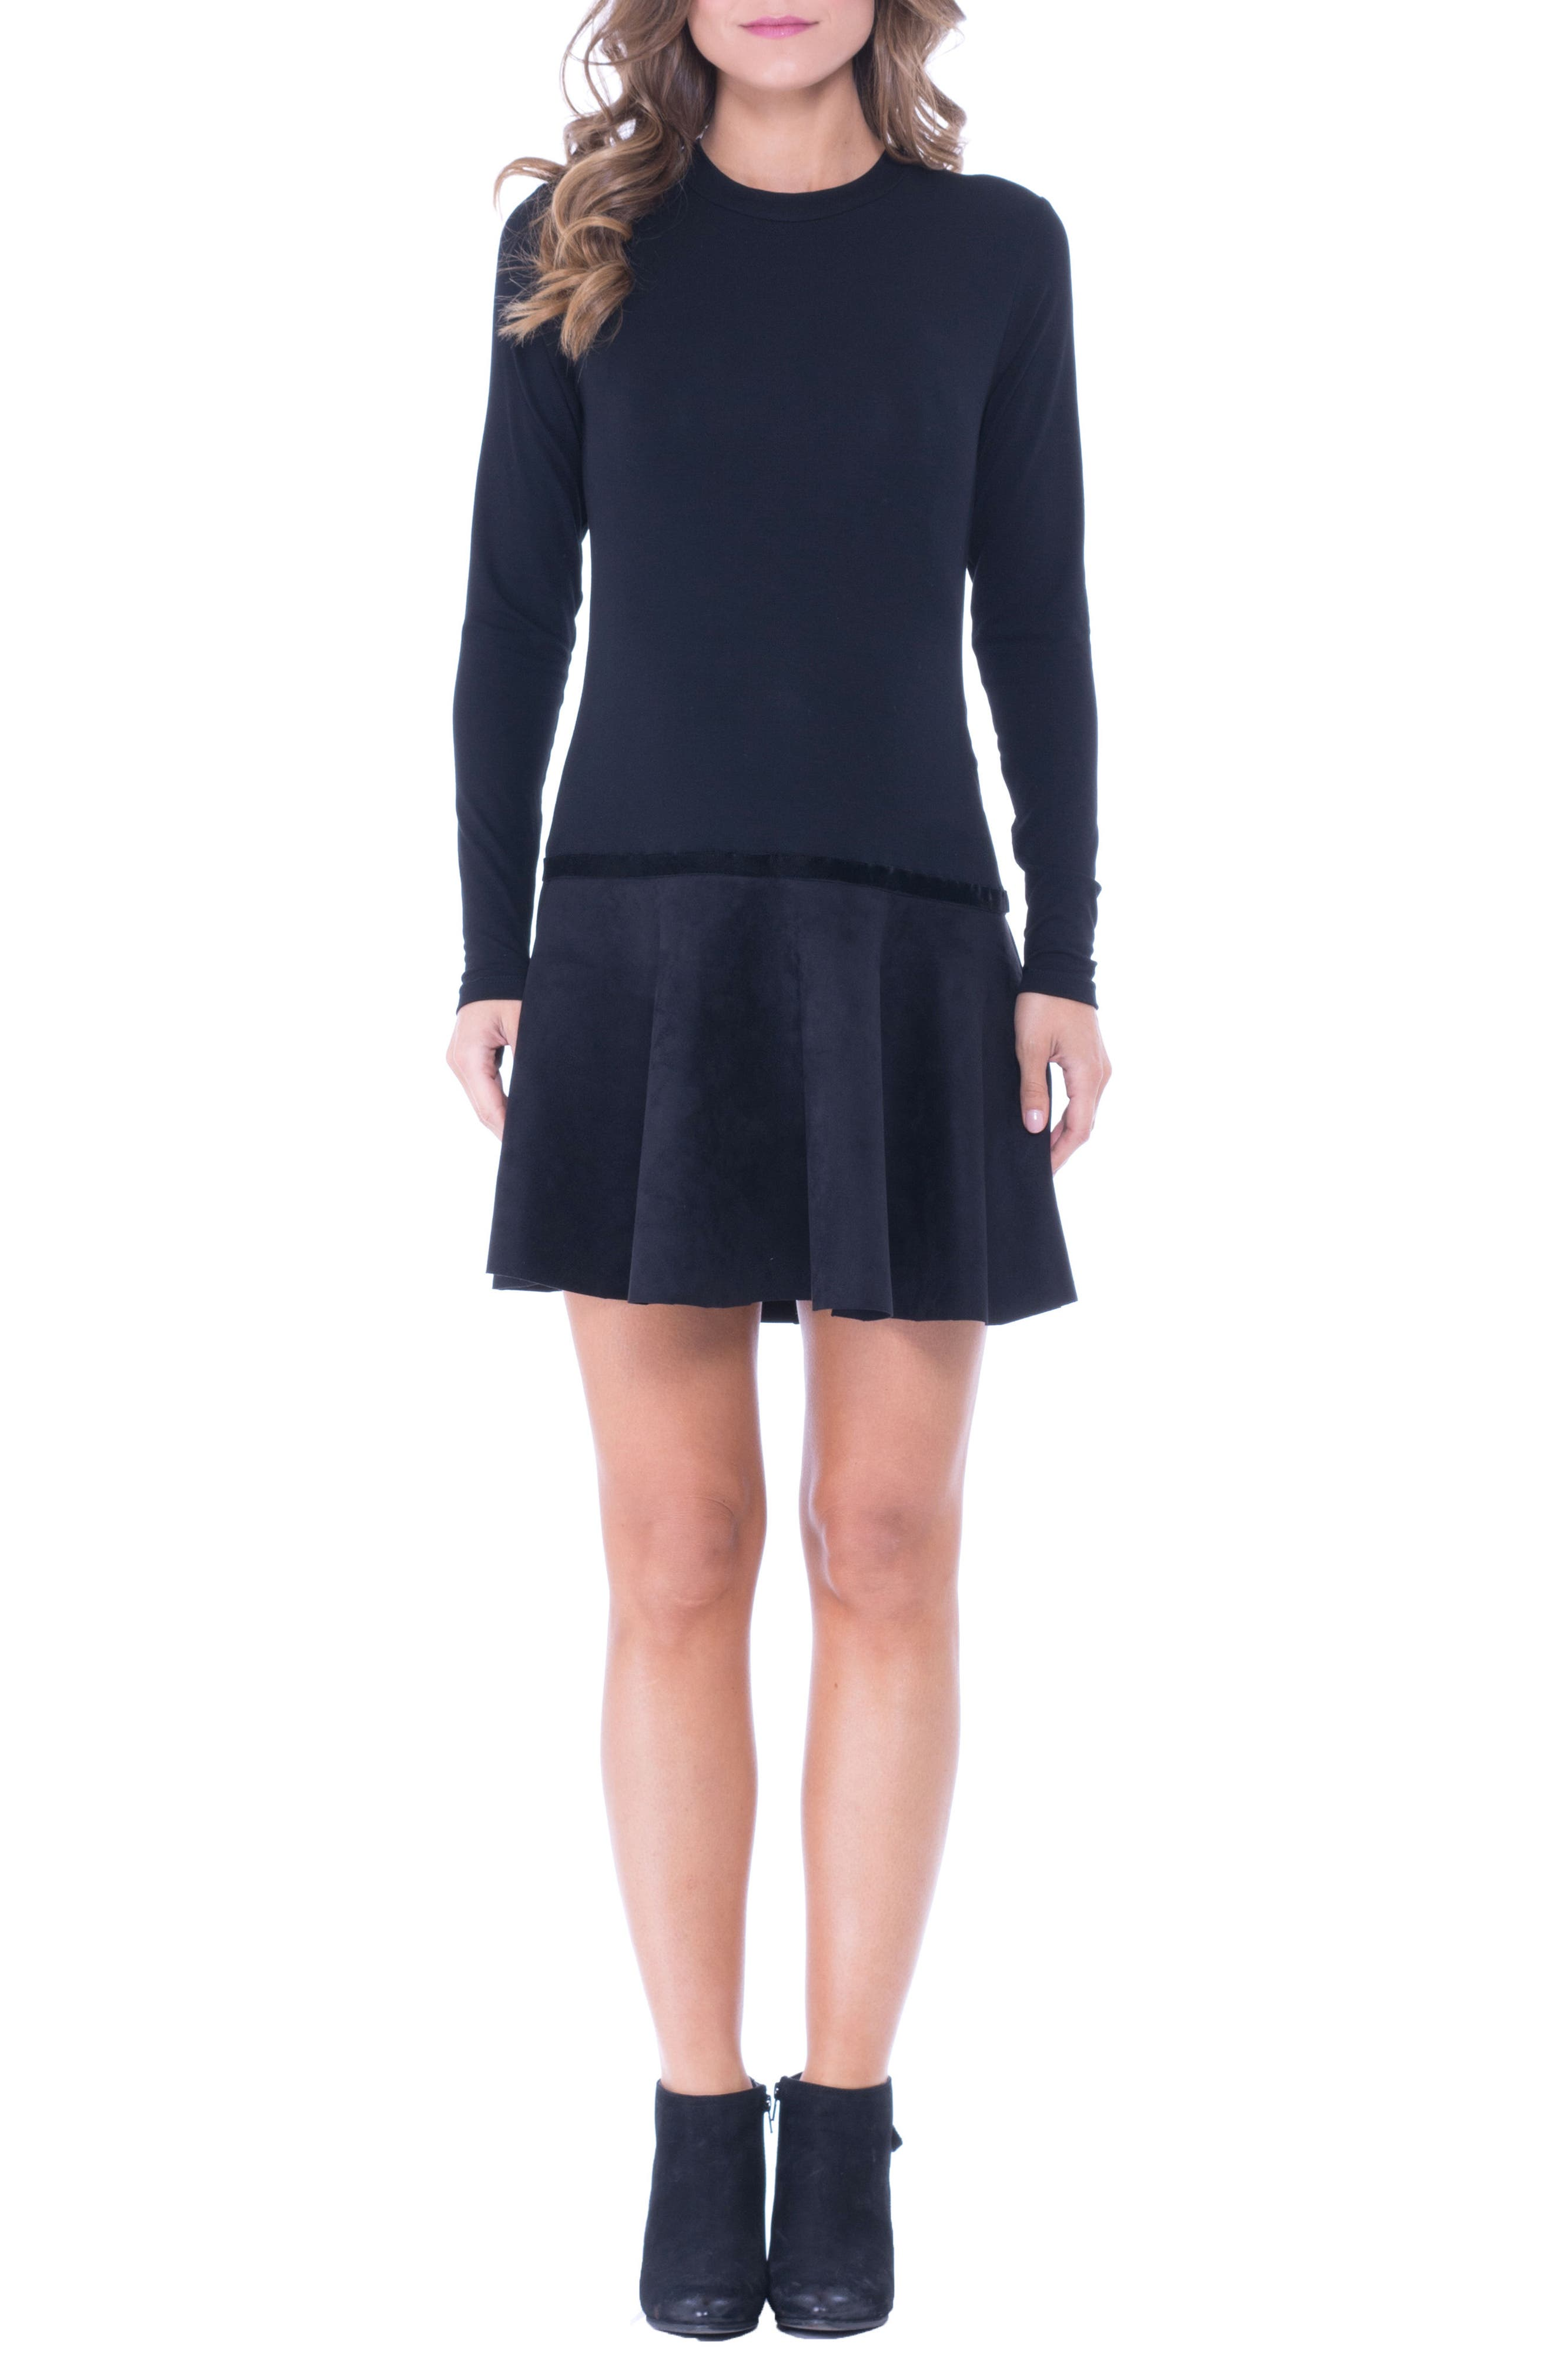 Faux Suede Skirt Maternity Skater Dress,                         Main,                         color, Black